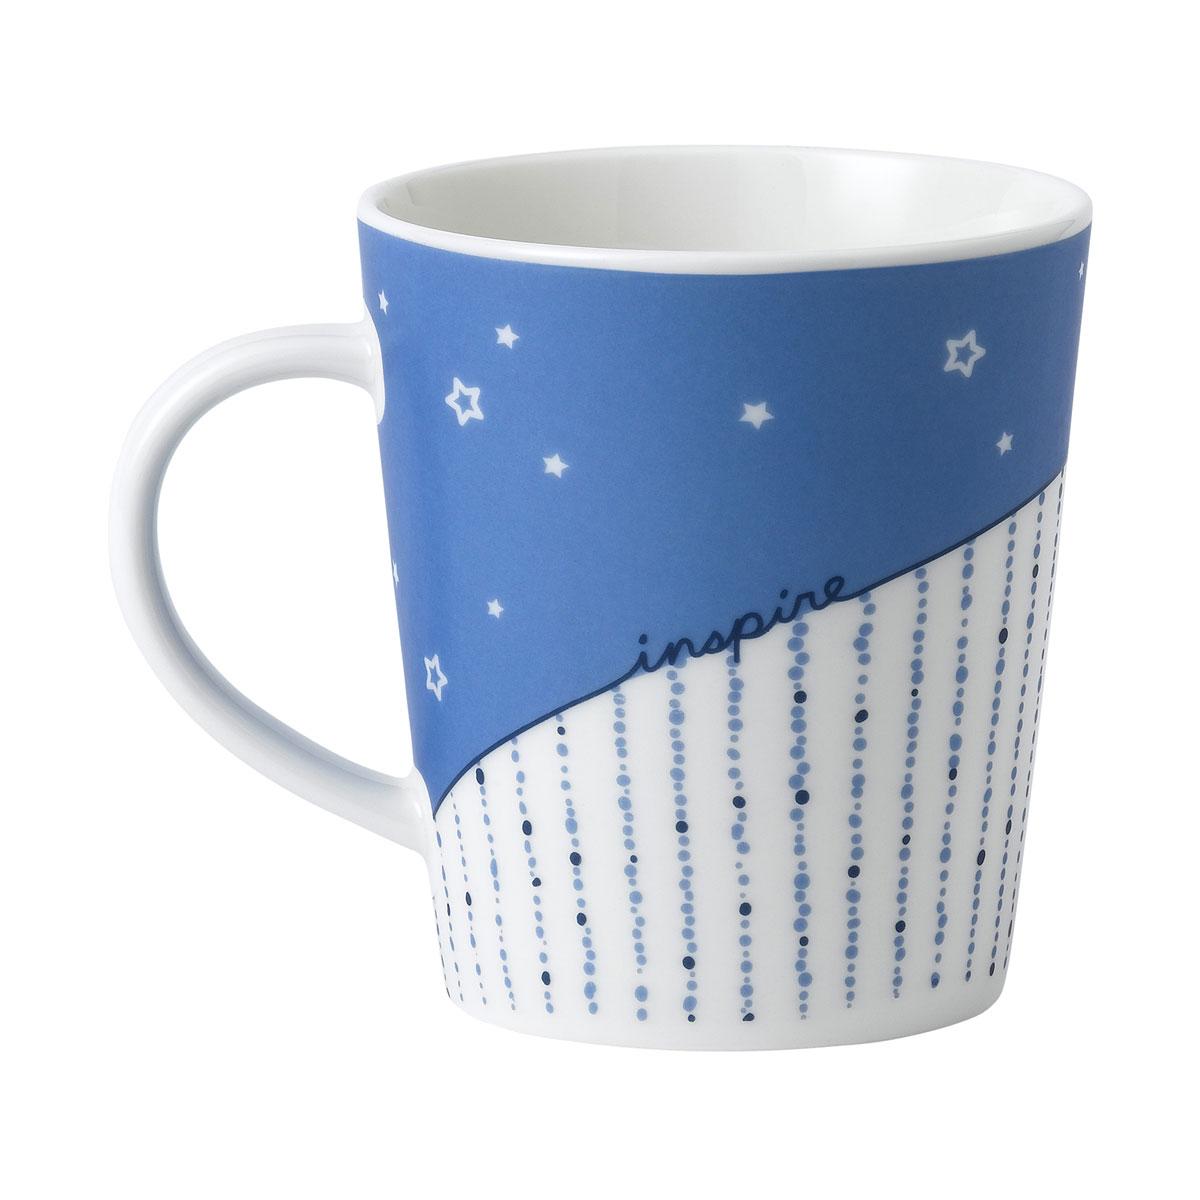 ED Ellen DeGeneres by Royal Doulton, Inspire Mug